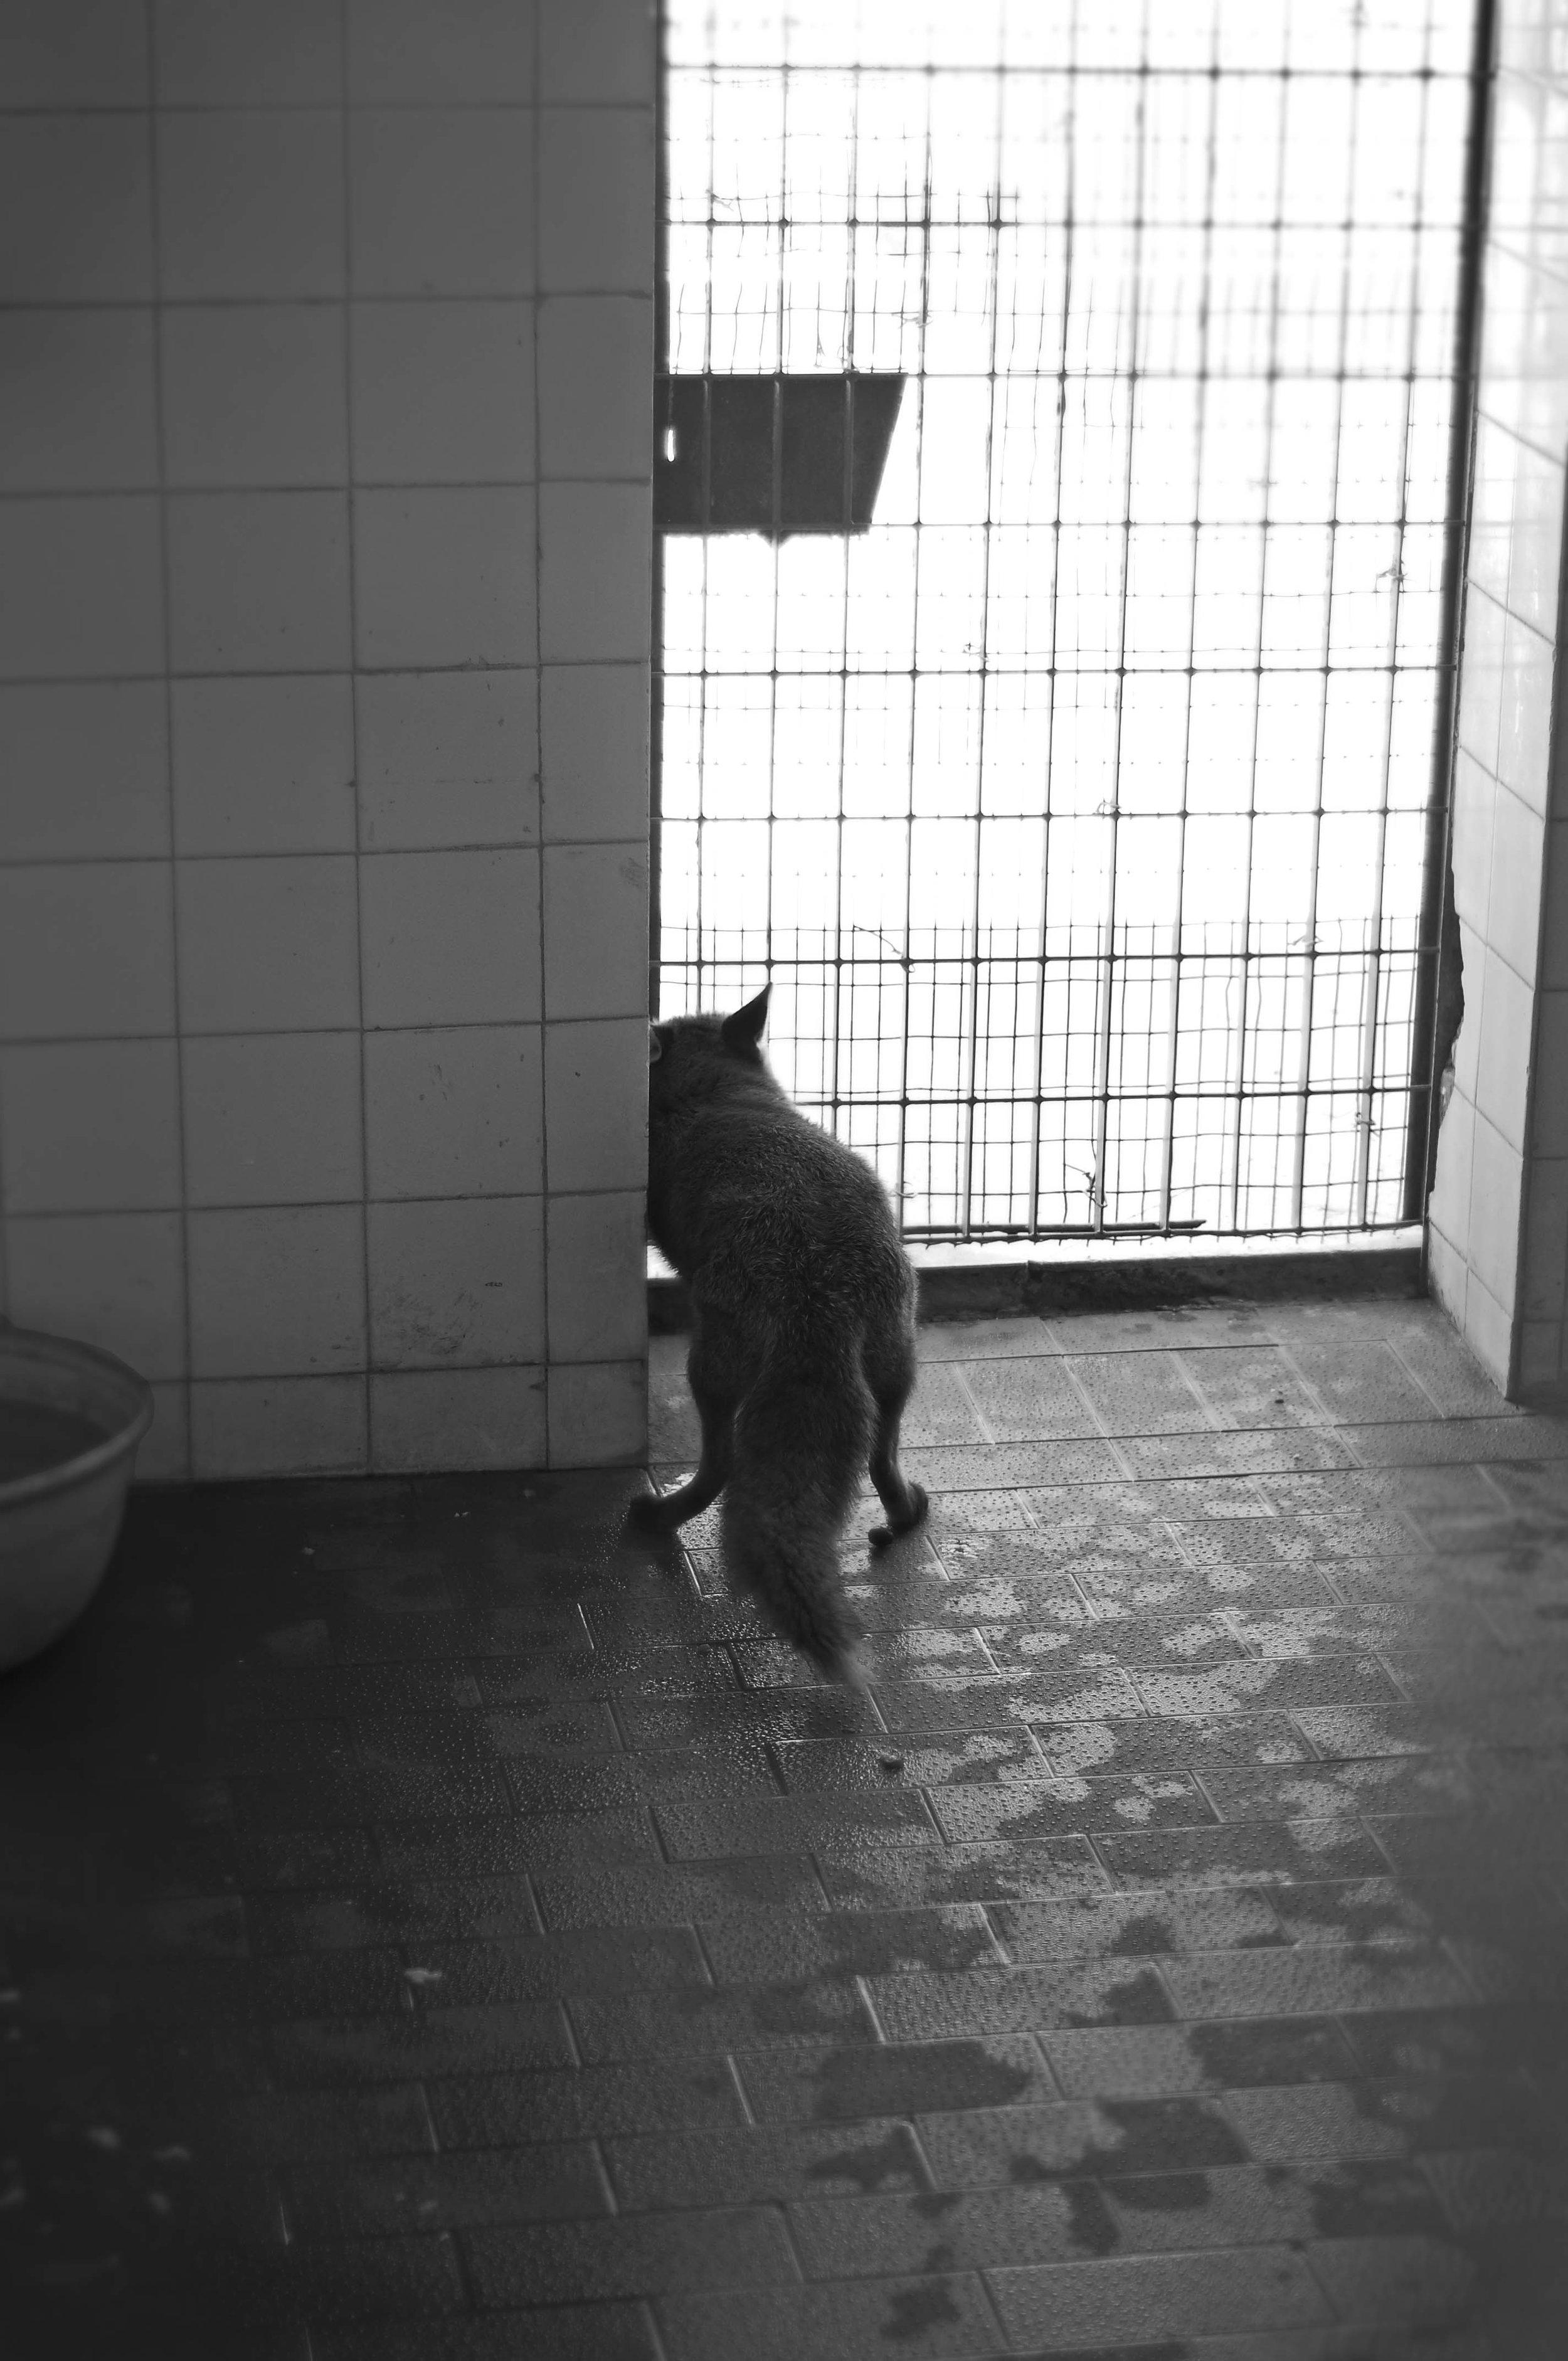 sad animals #10.jpg